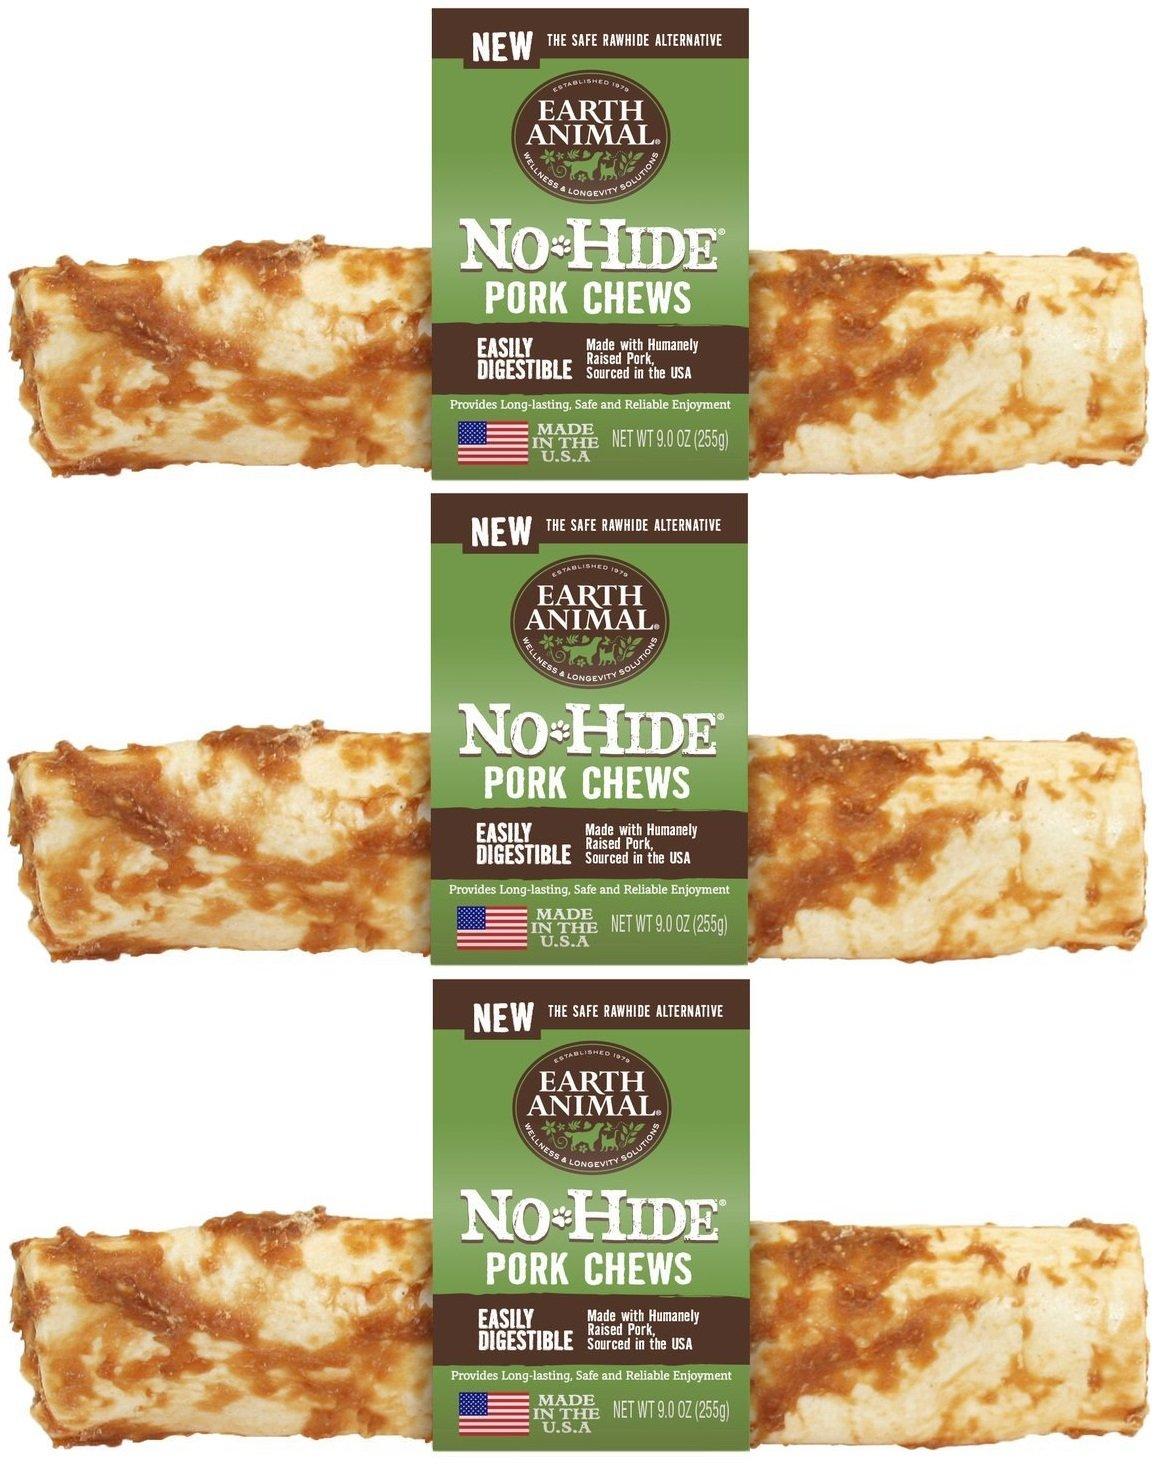 Earth Animal 3 Pack of No-Hide Pork Chews, 7-Inch